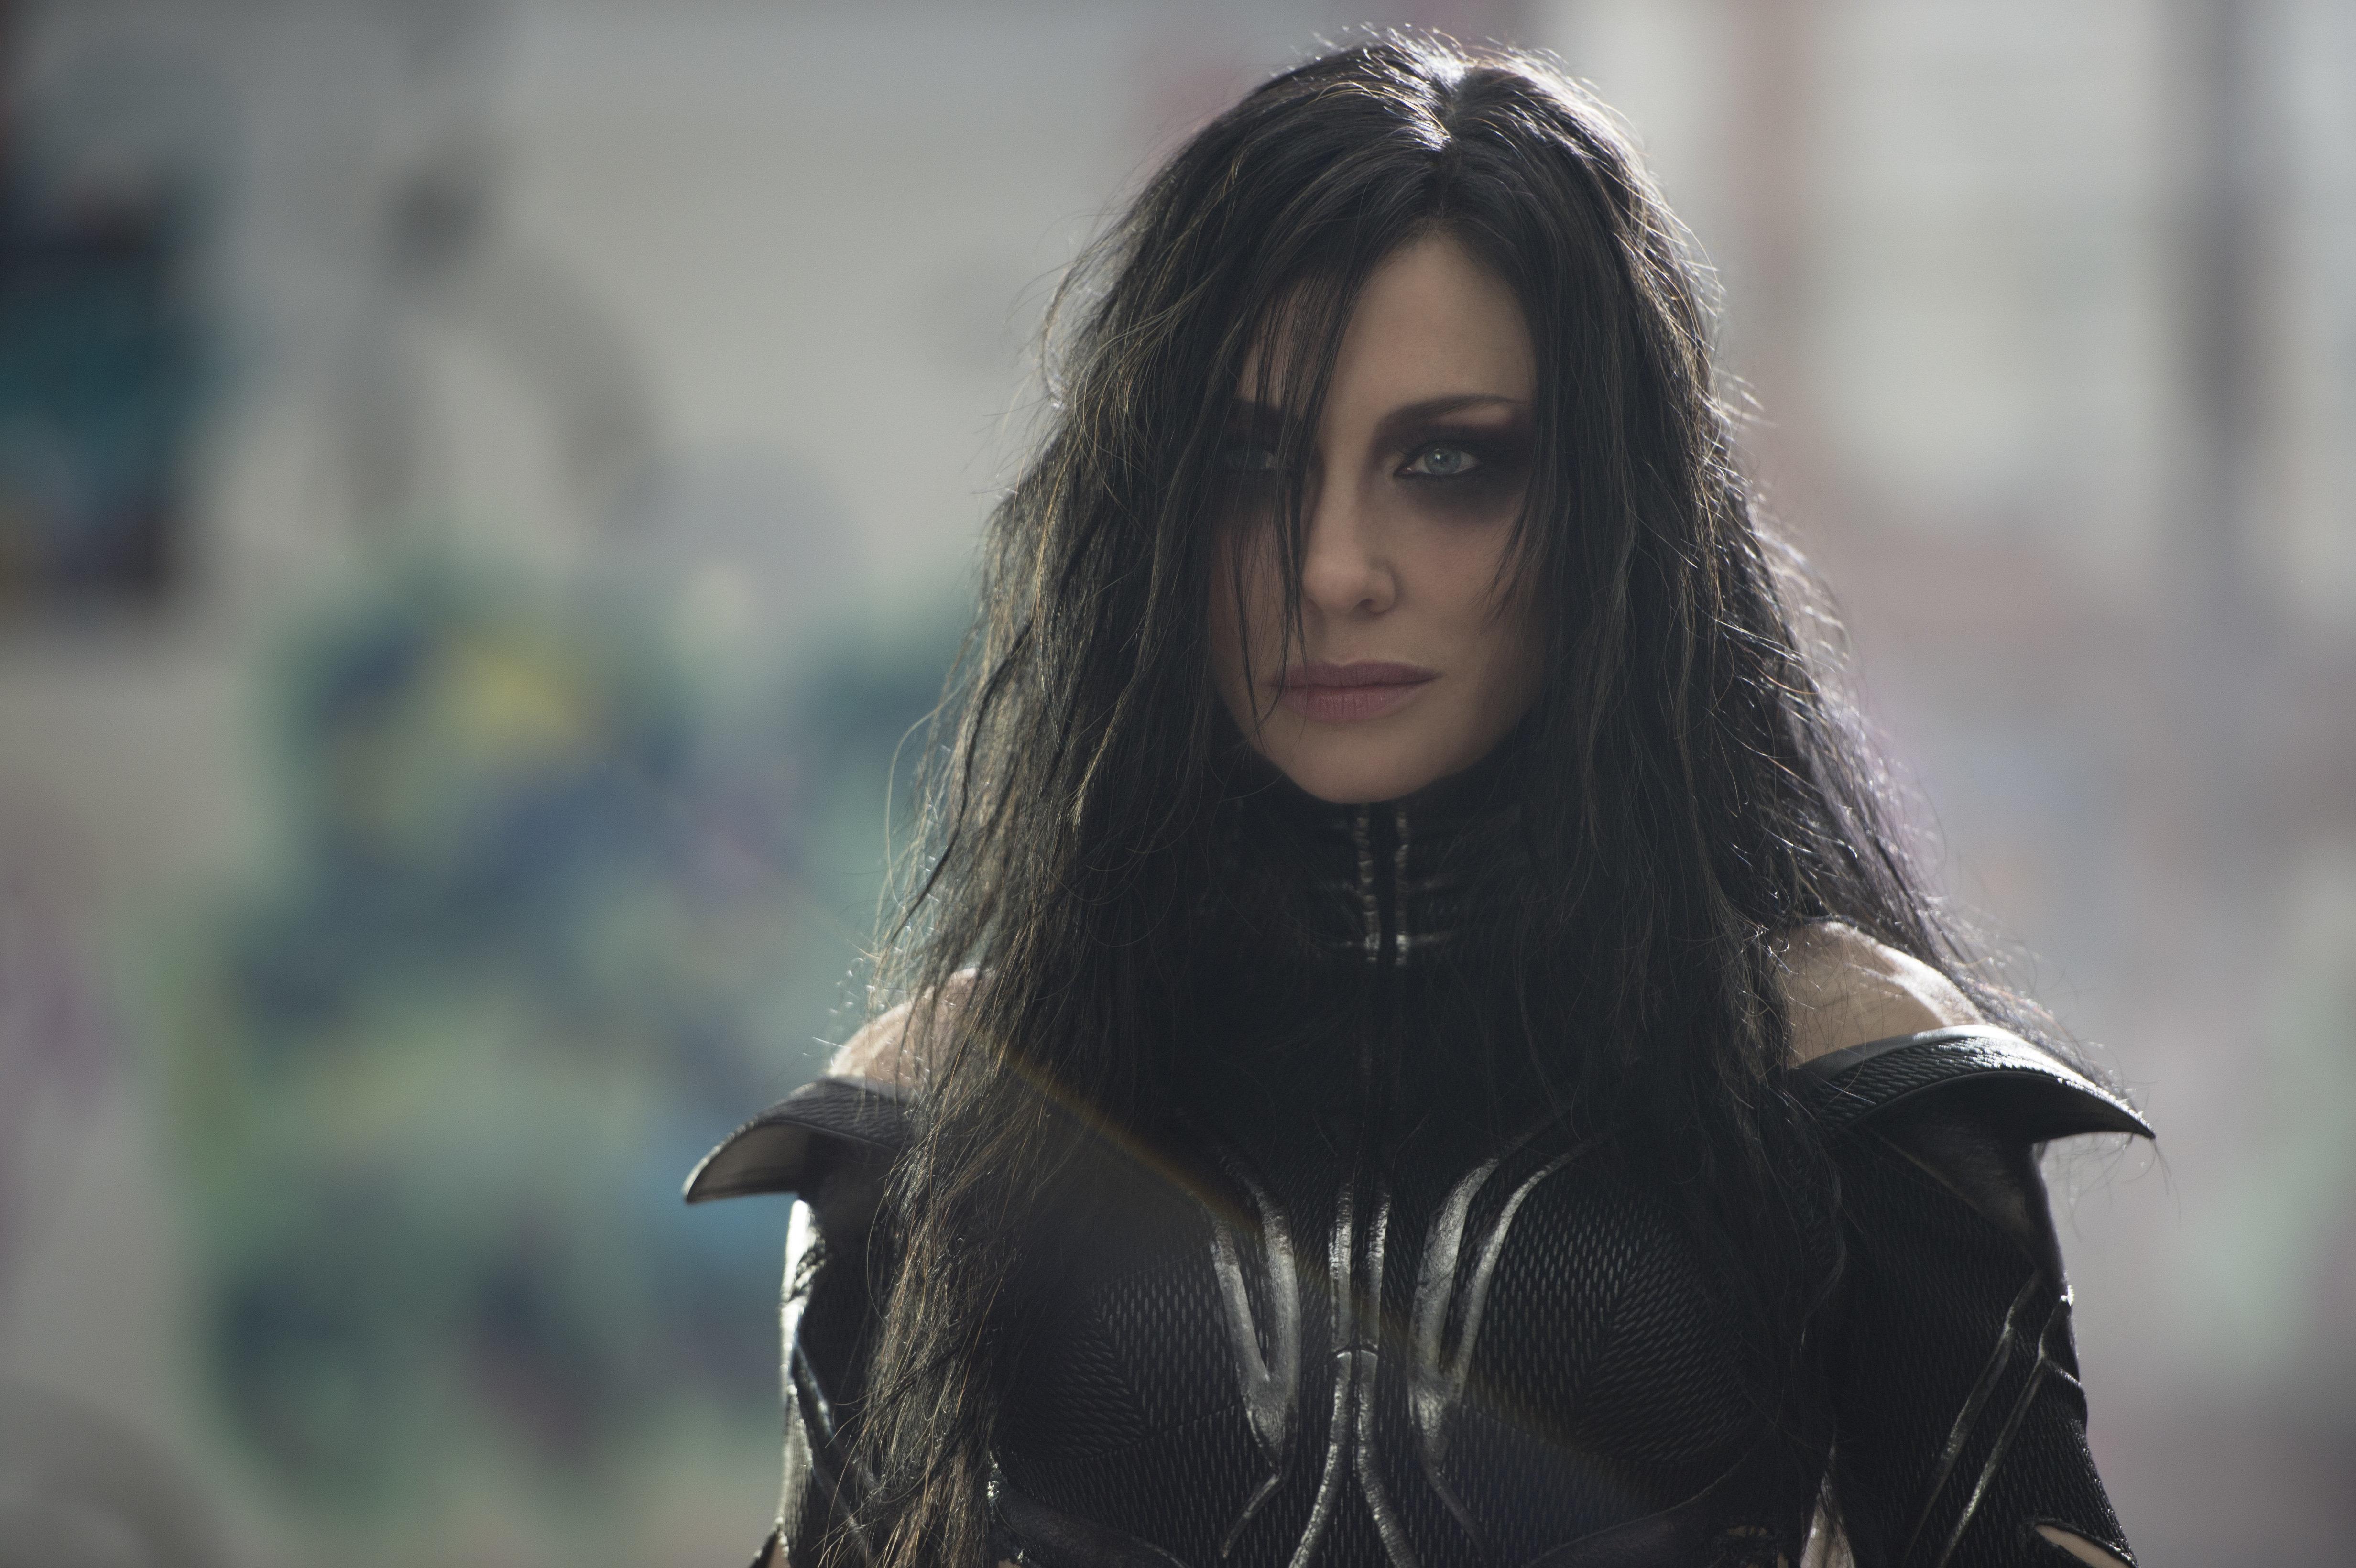 The 'Thor: Ragnarok' Trailer Has Cate Blanchett's Villainy, Led Zeppelin And A Green